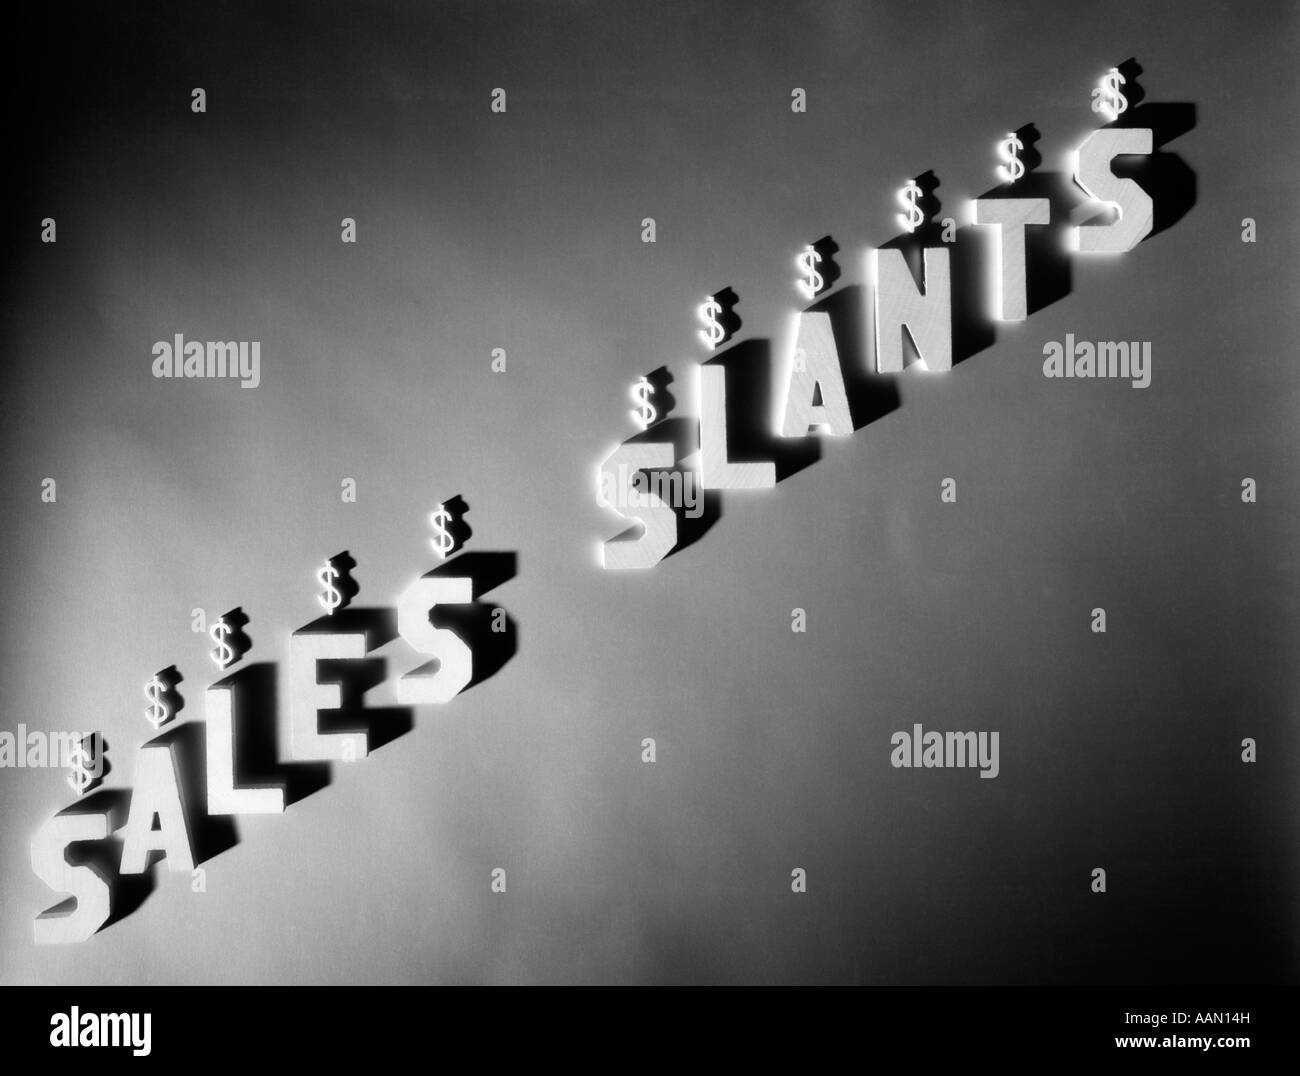 SALES SLANTS - Stock Image